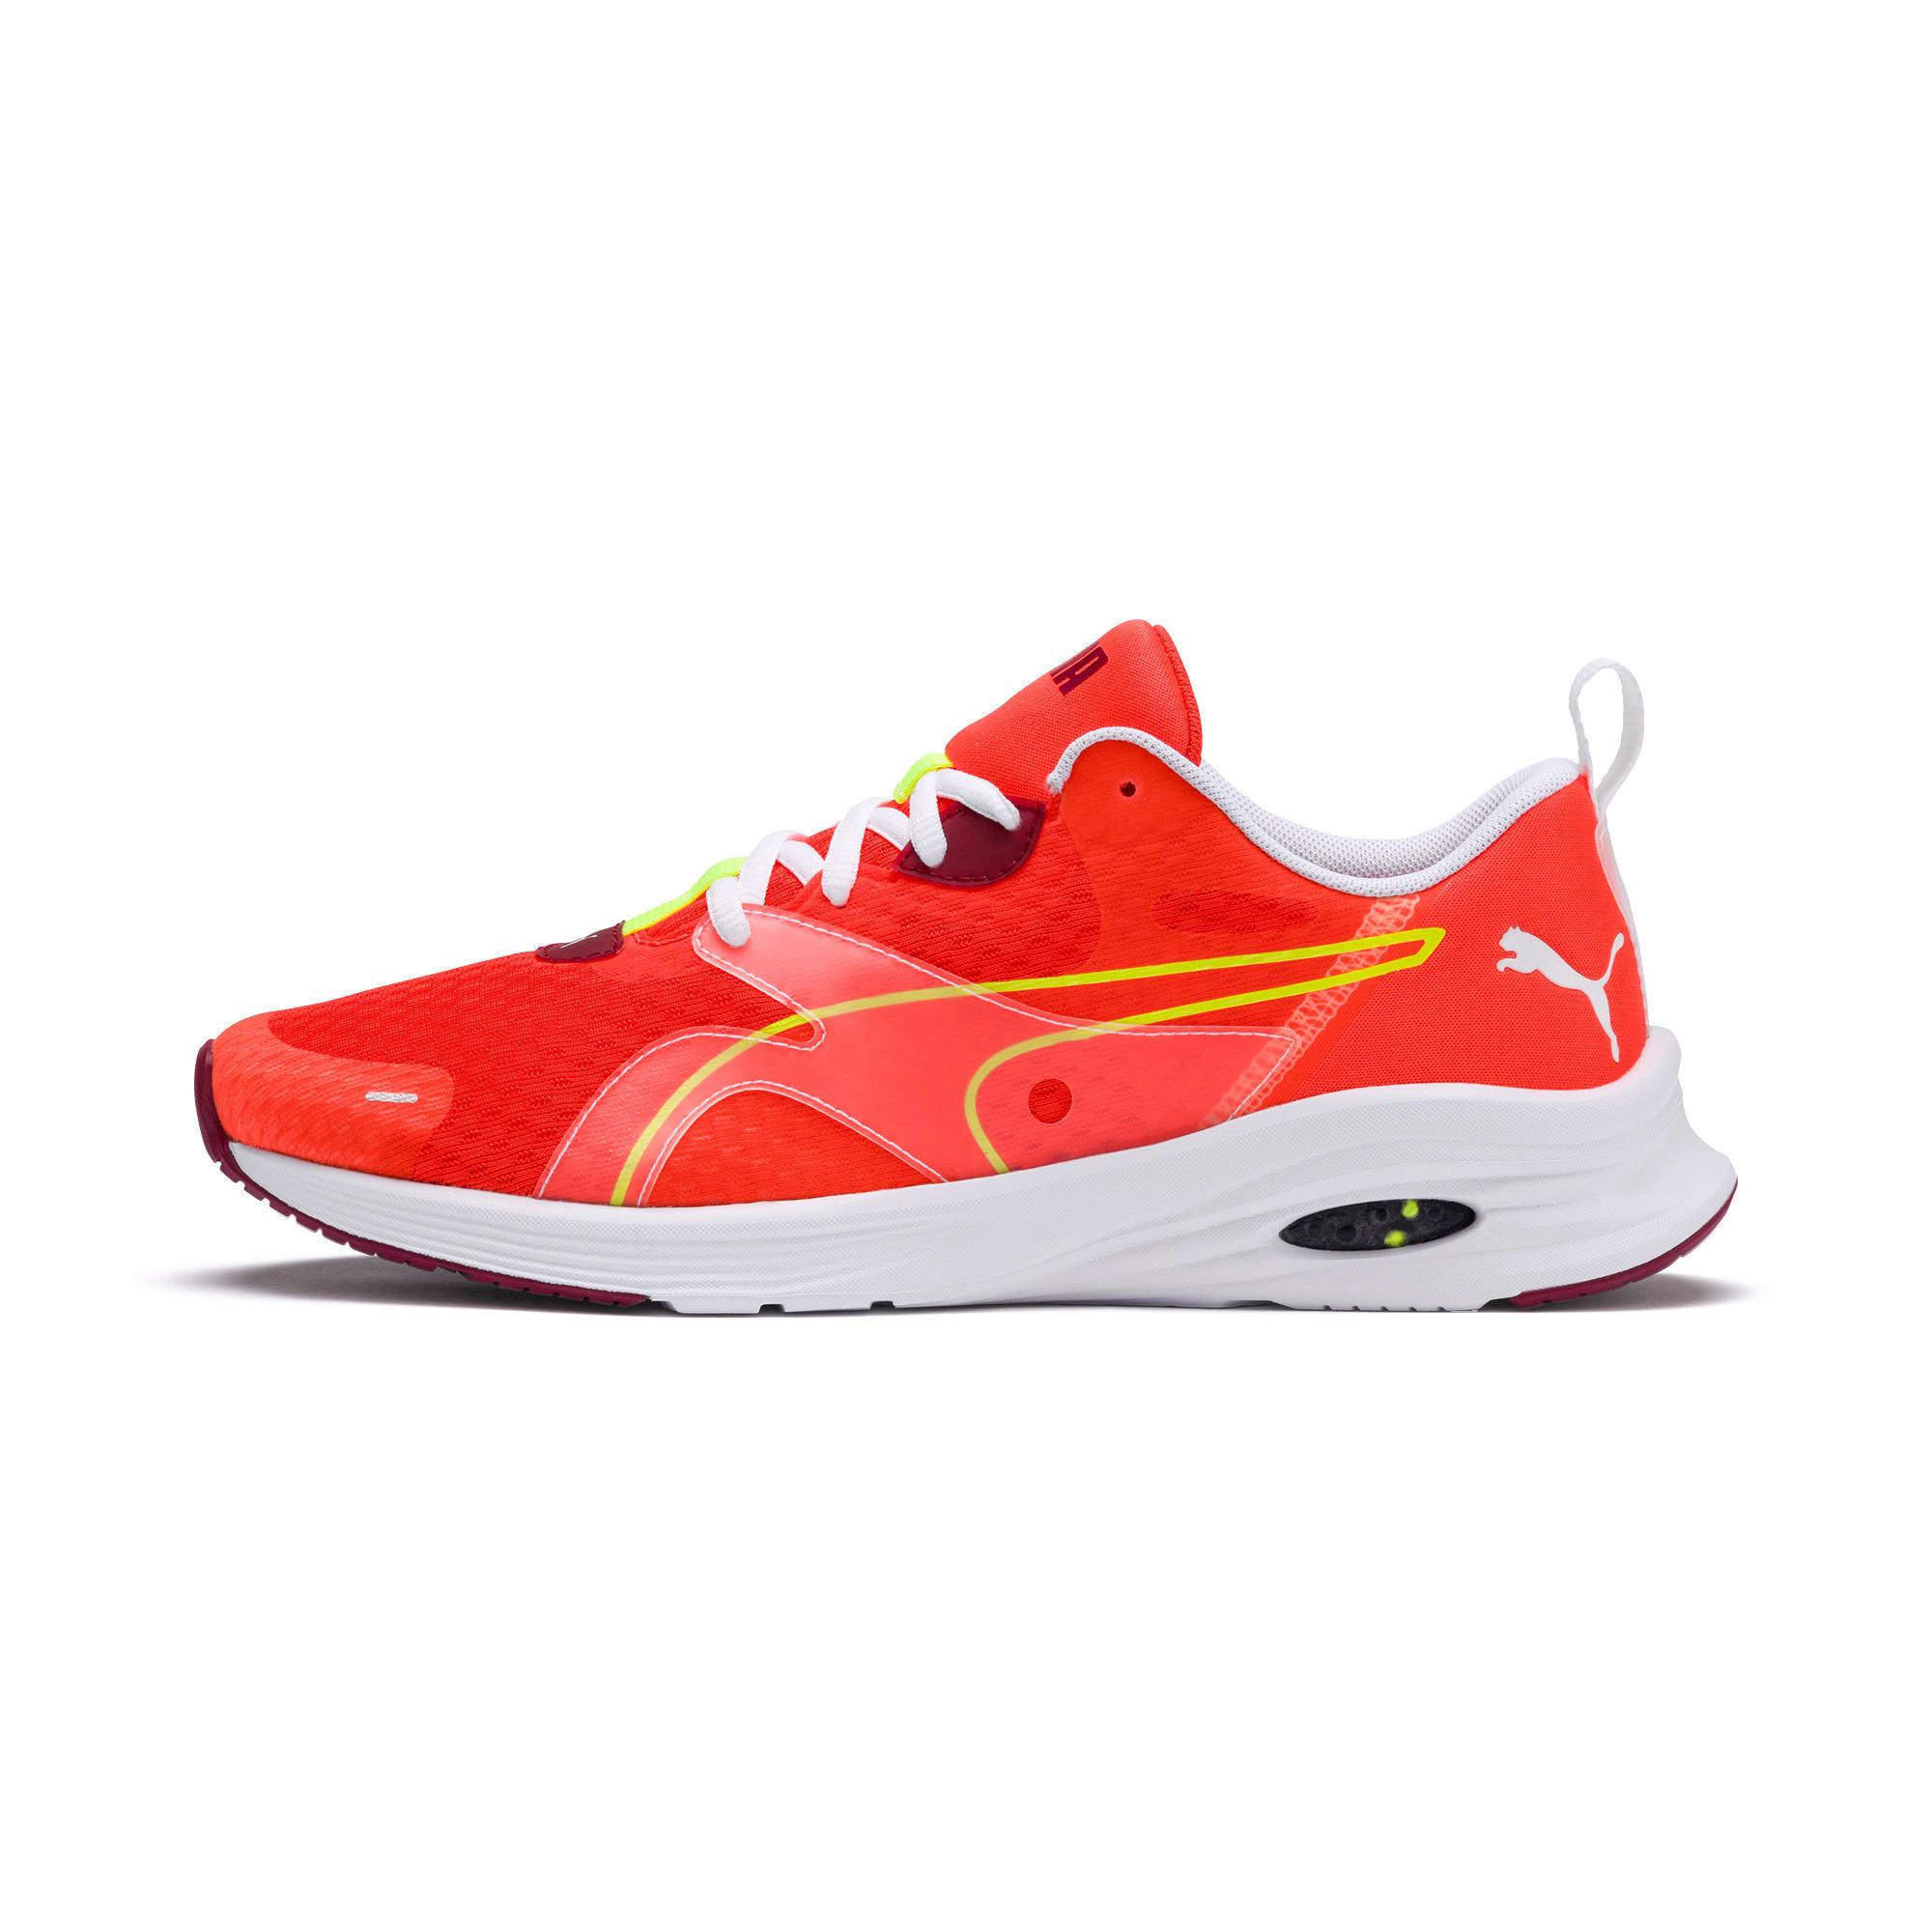 Thumbnail 1 of HYBRID Fuego Men's Running Shoes, Nrgy Red-Rhubarb, medium